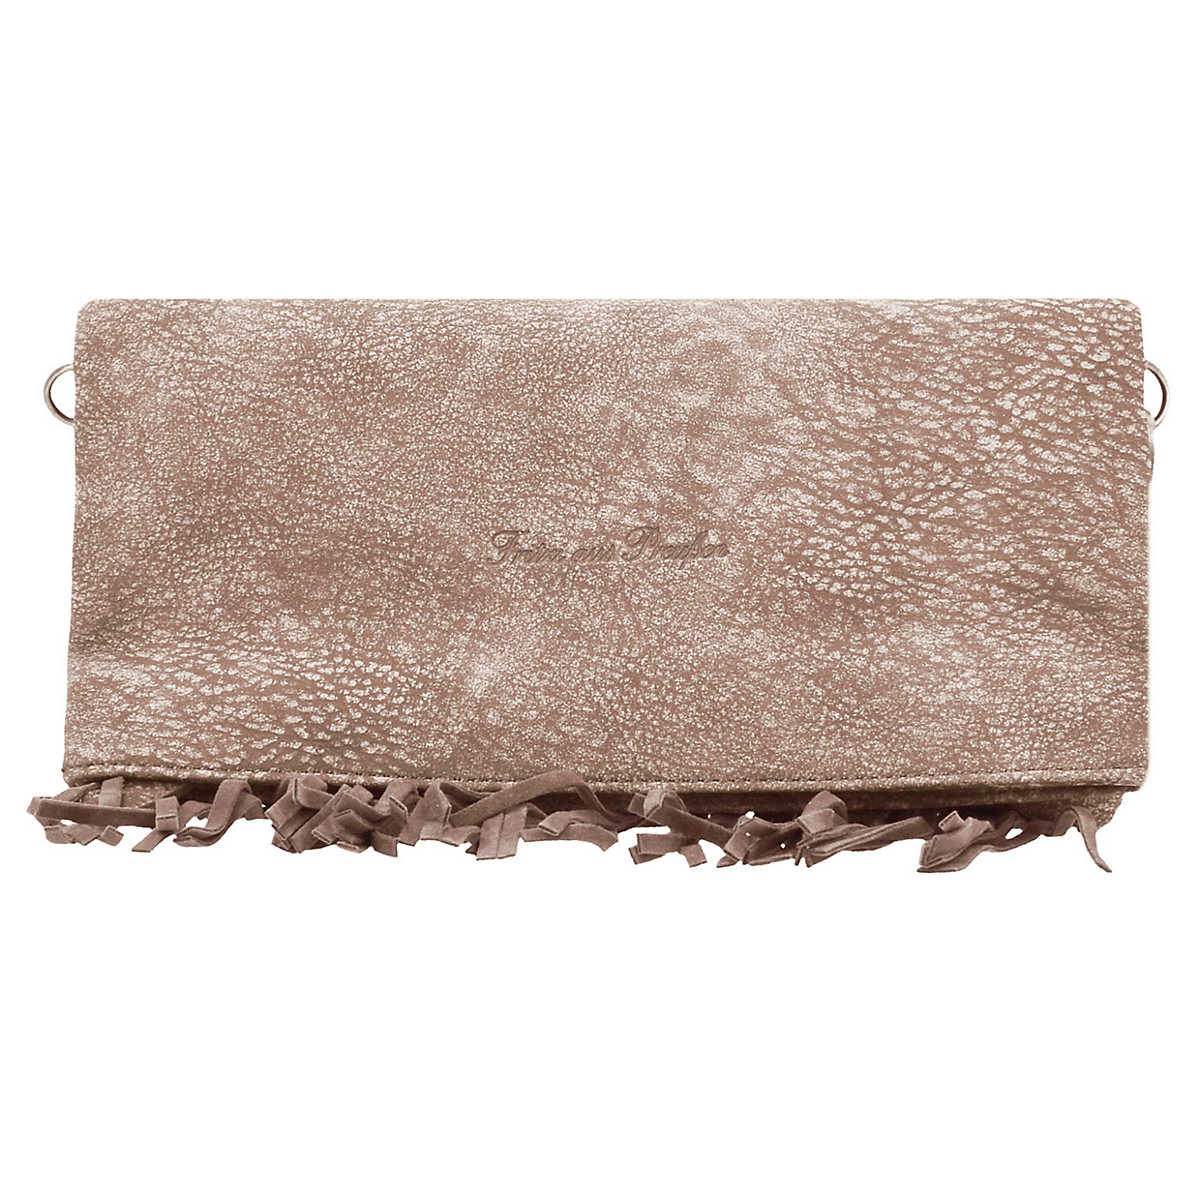 Ronja Fringe Kuba Clutch Tasche 29 cm beige - Fritzi aus PreuÃ?Â?en - Clutch & Abendtaschen - Taschen - mirapodo.de